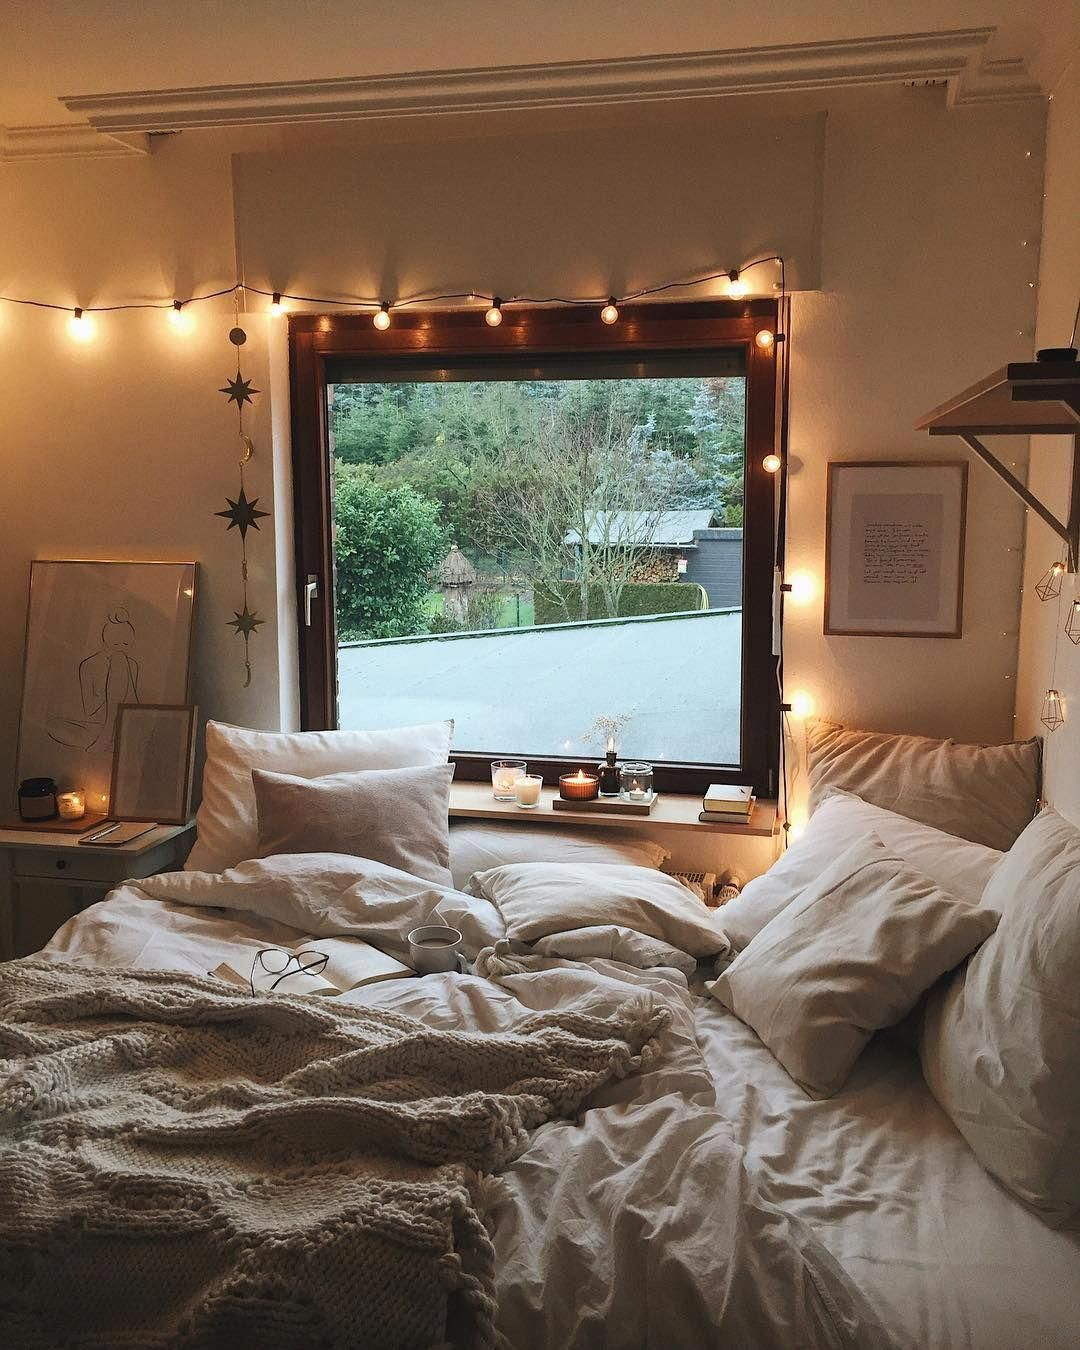 Luxus Schlafzimmer Möbel RustikalglamDekor   Aesthetic bedroom, Minimalist bedroom, Luxurious ...